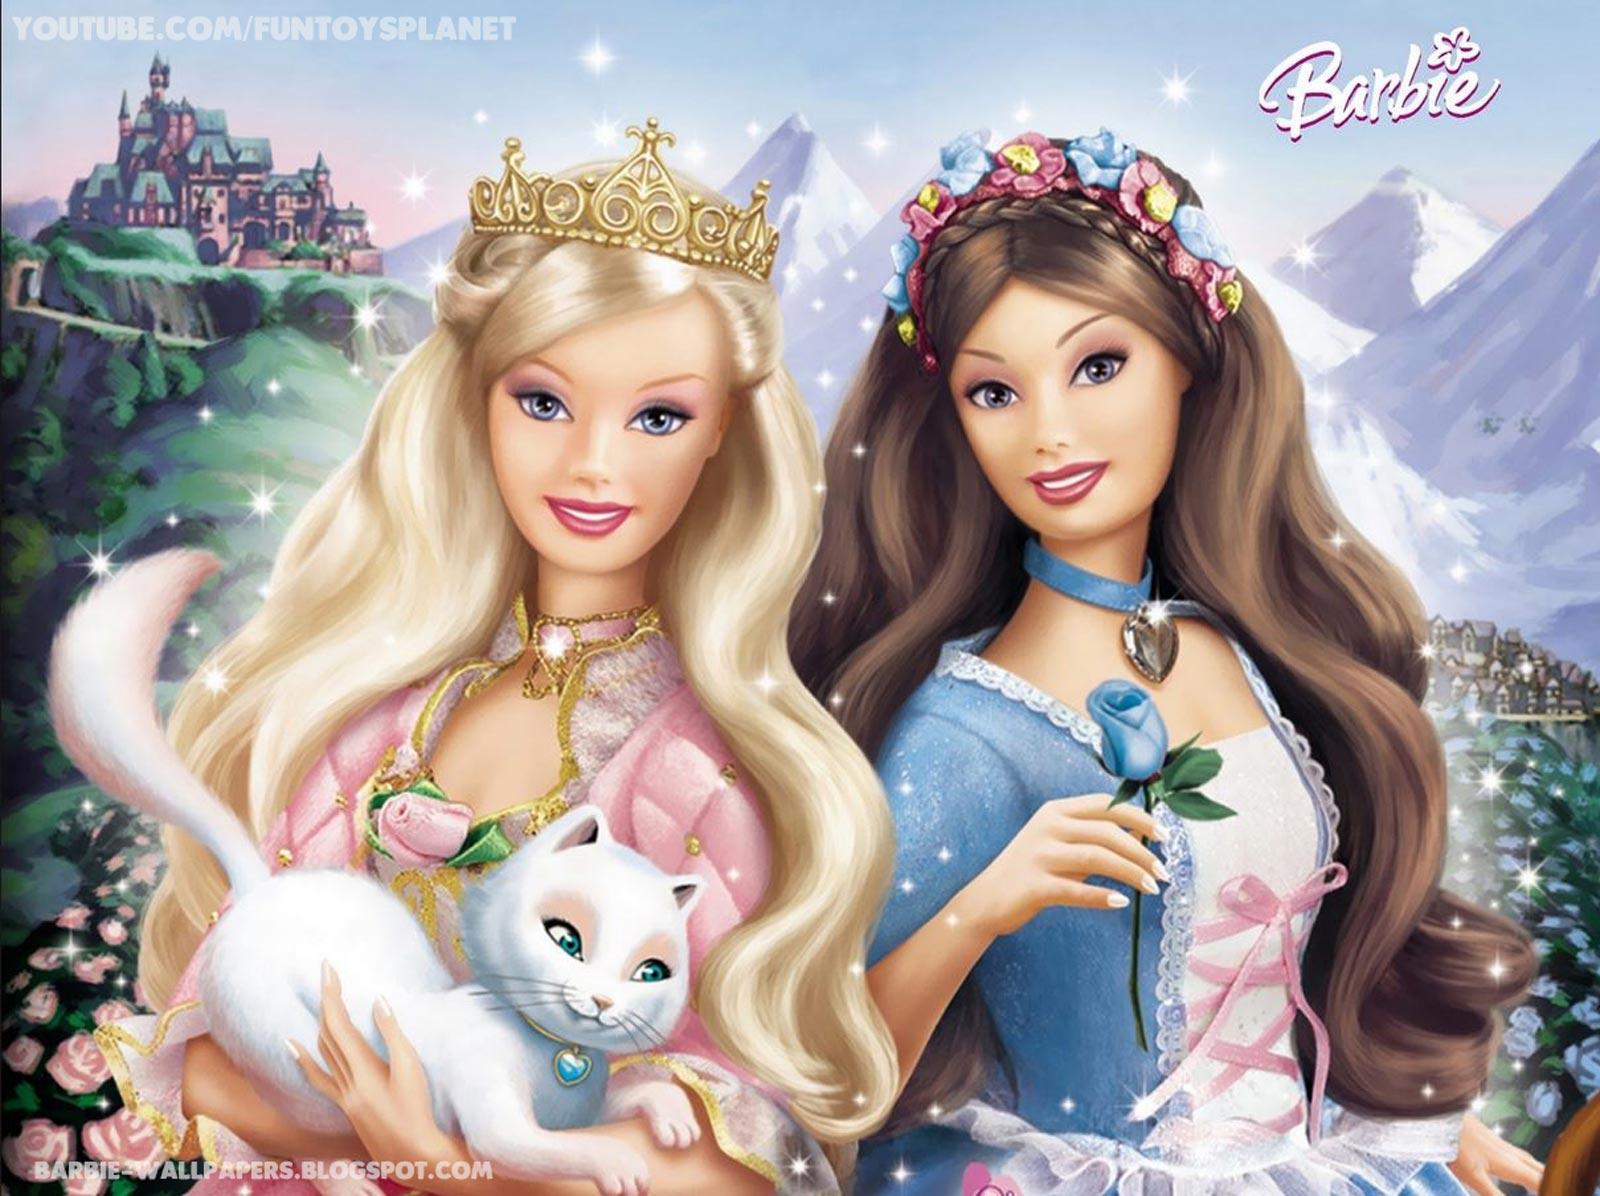 Barbie wallpapers barbie wallpapers 04 barbie wallpapers 04 voltagebd Choice Image